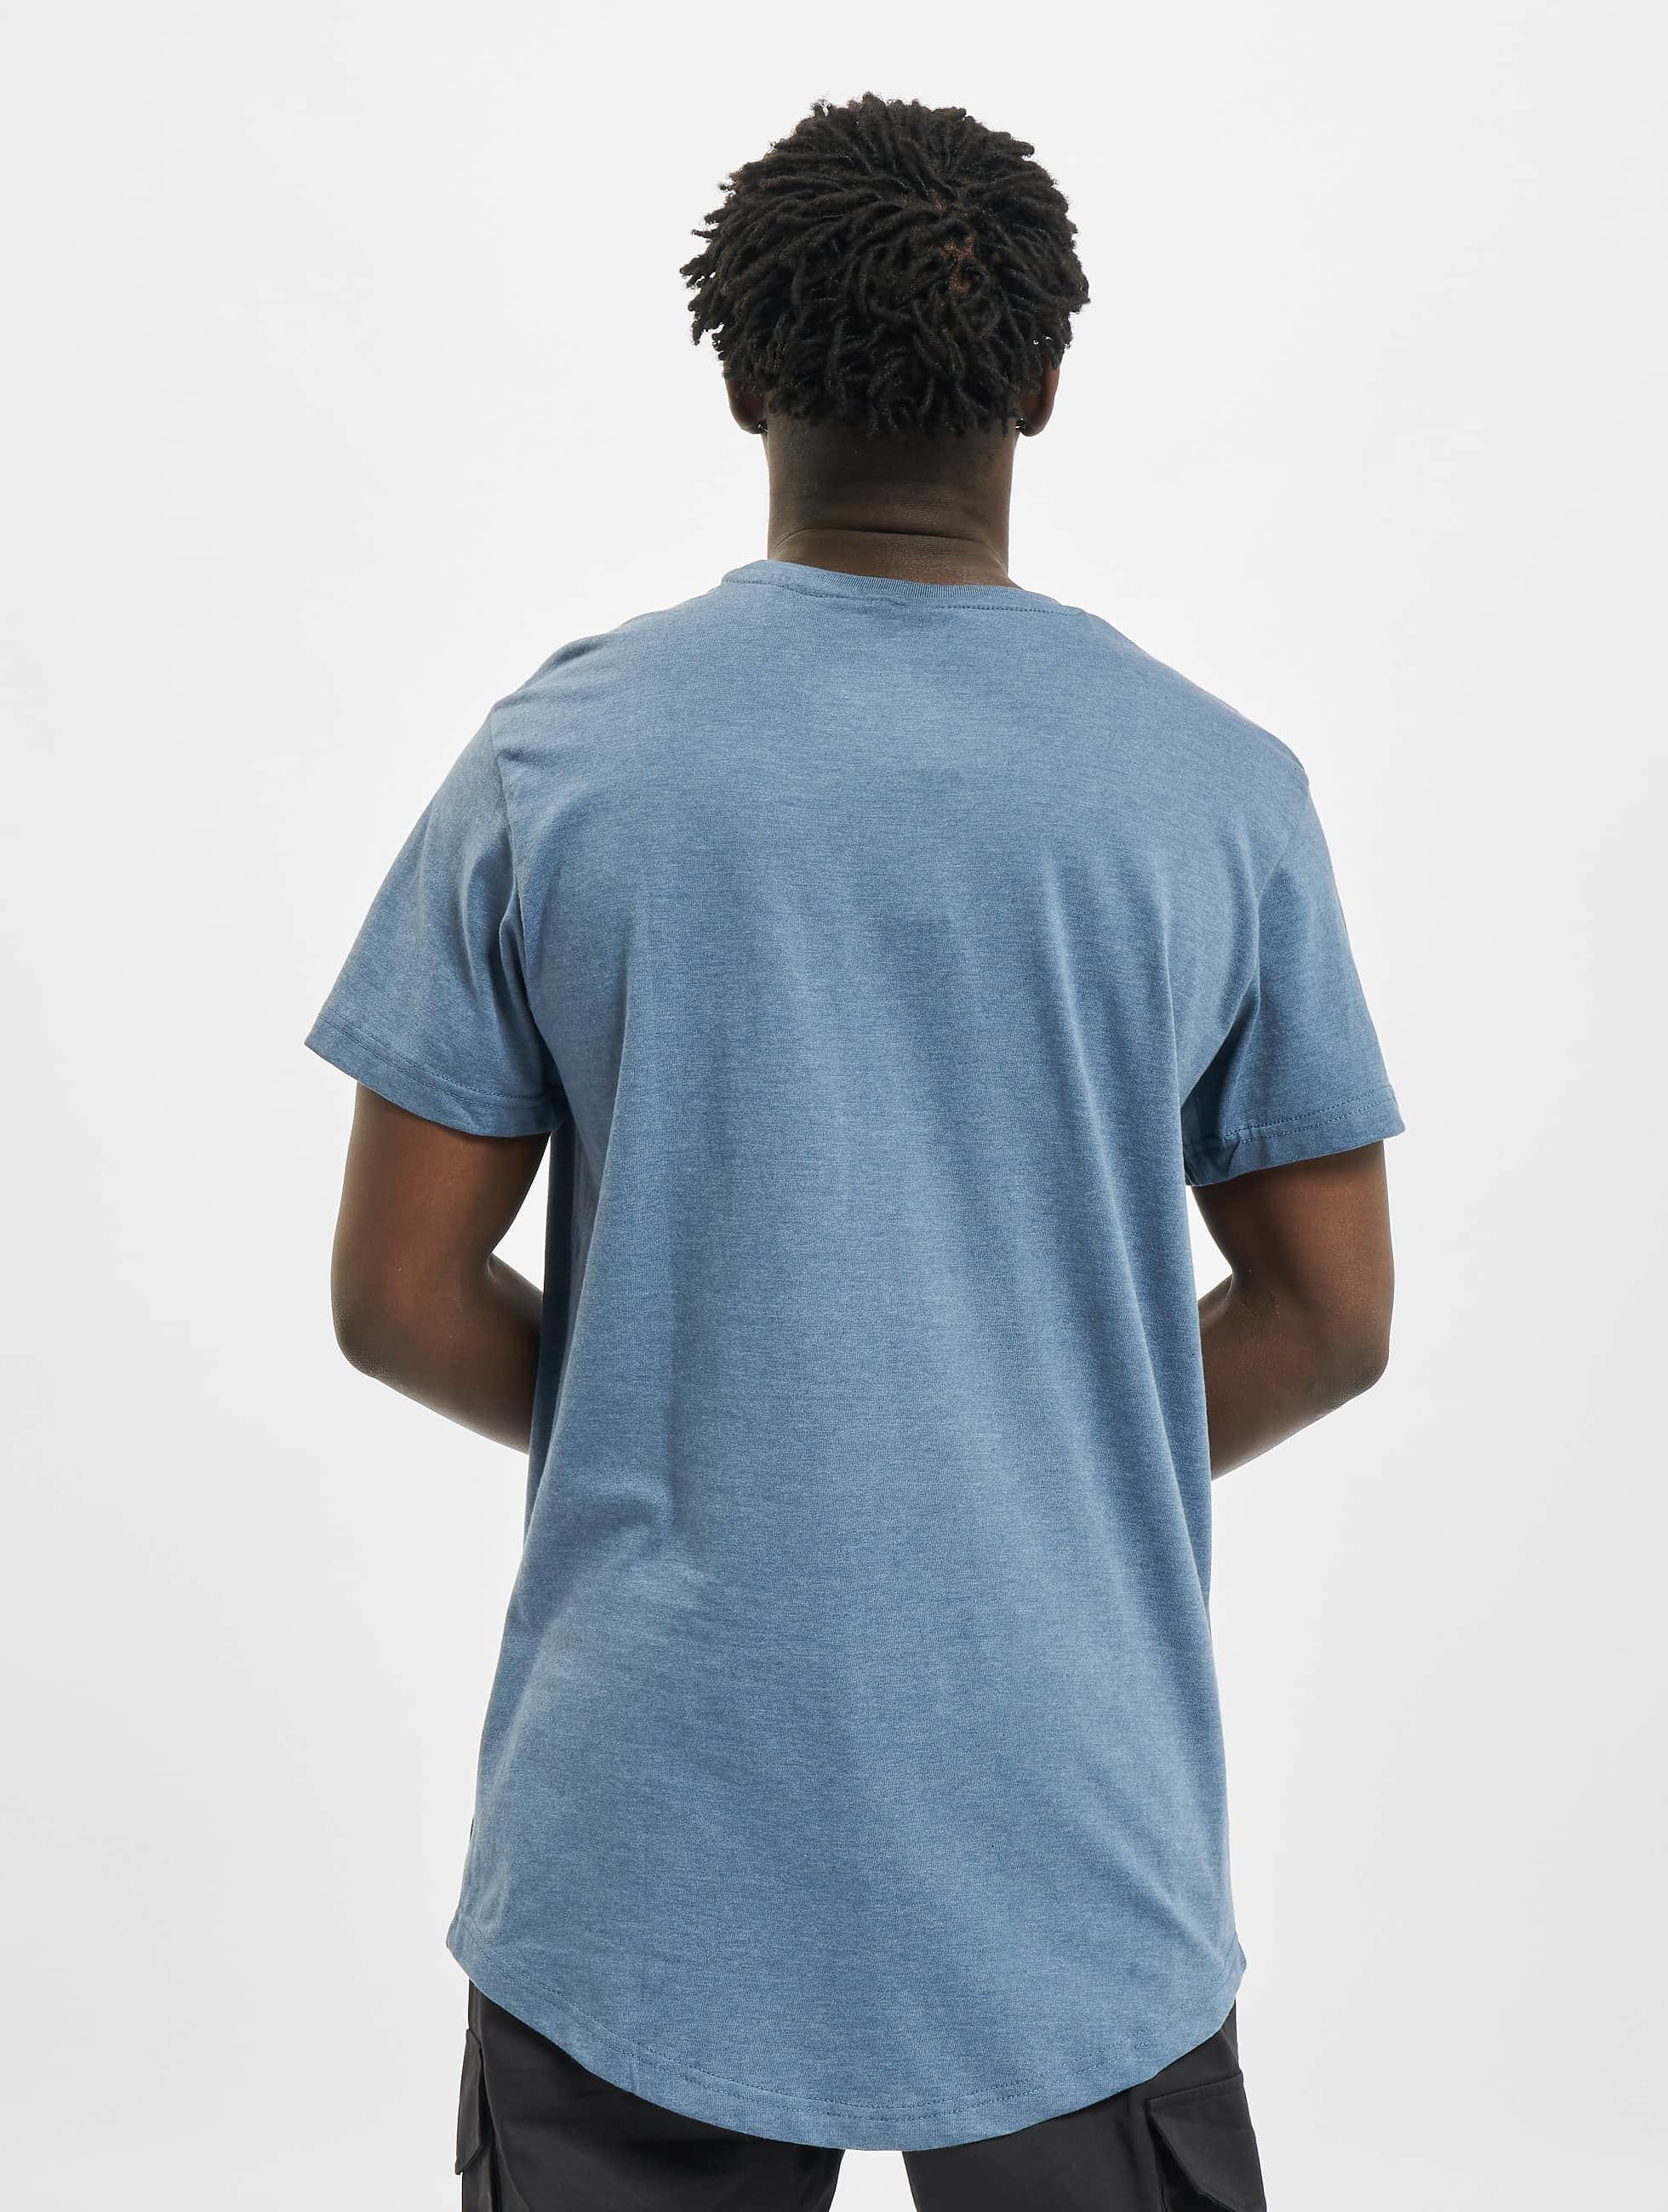 Urban Classics Tall Tees Shaped Melange Oversized Long blauw